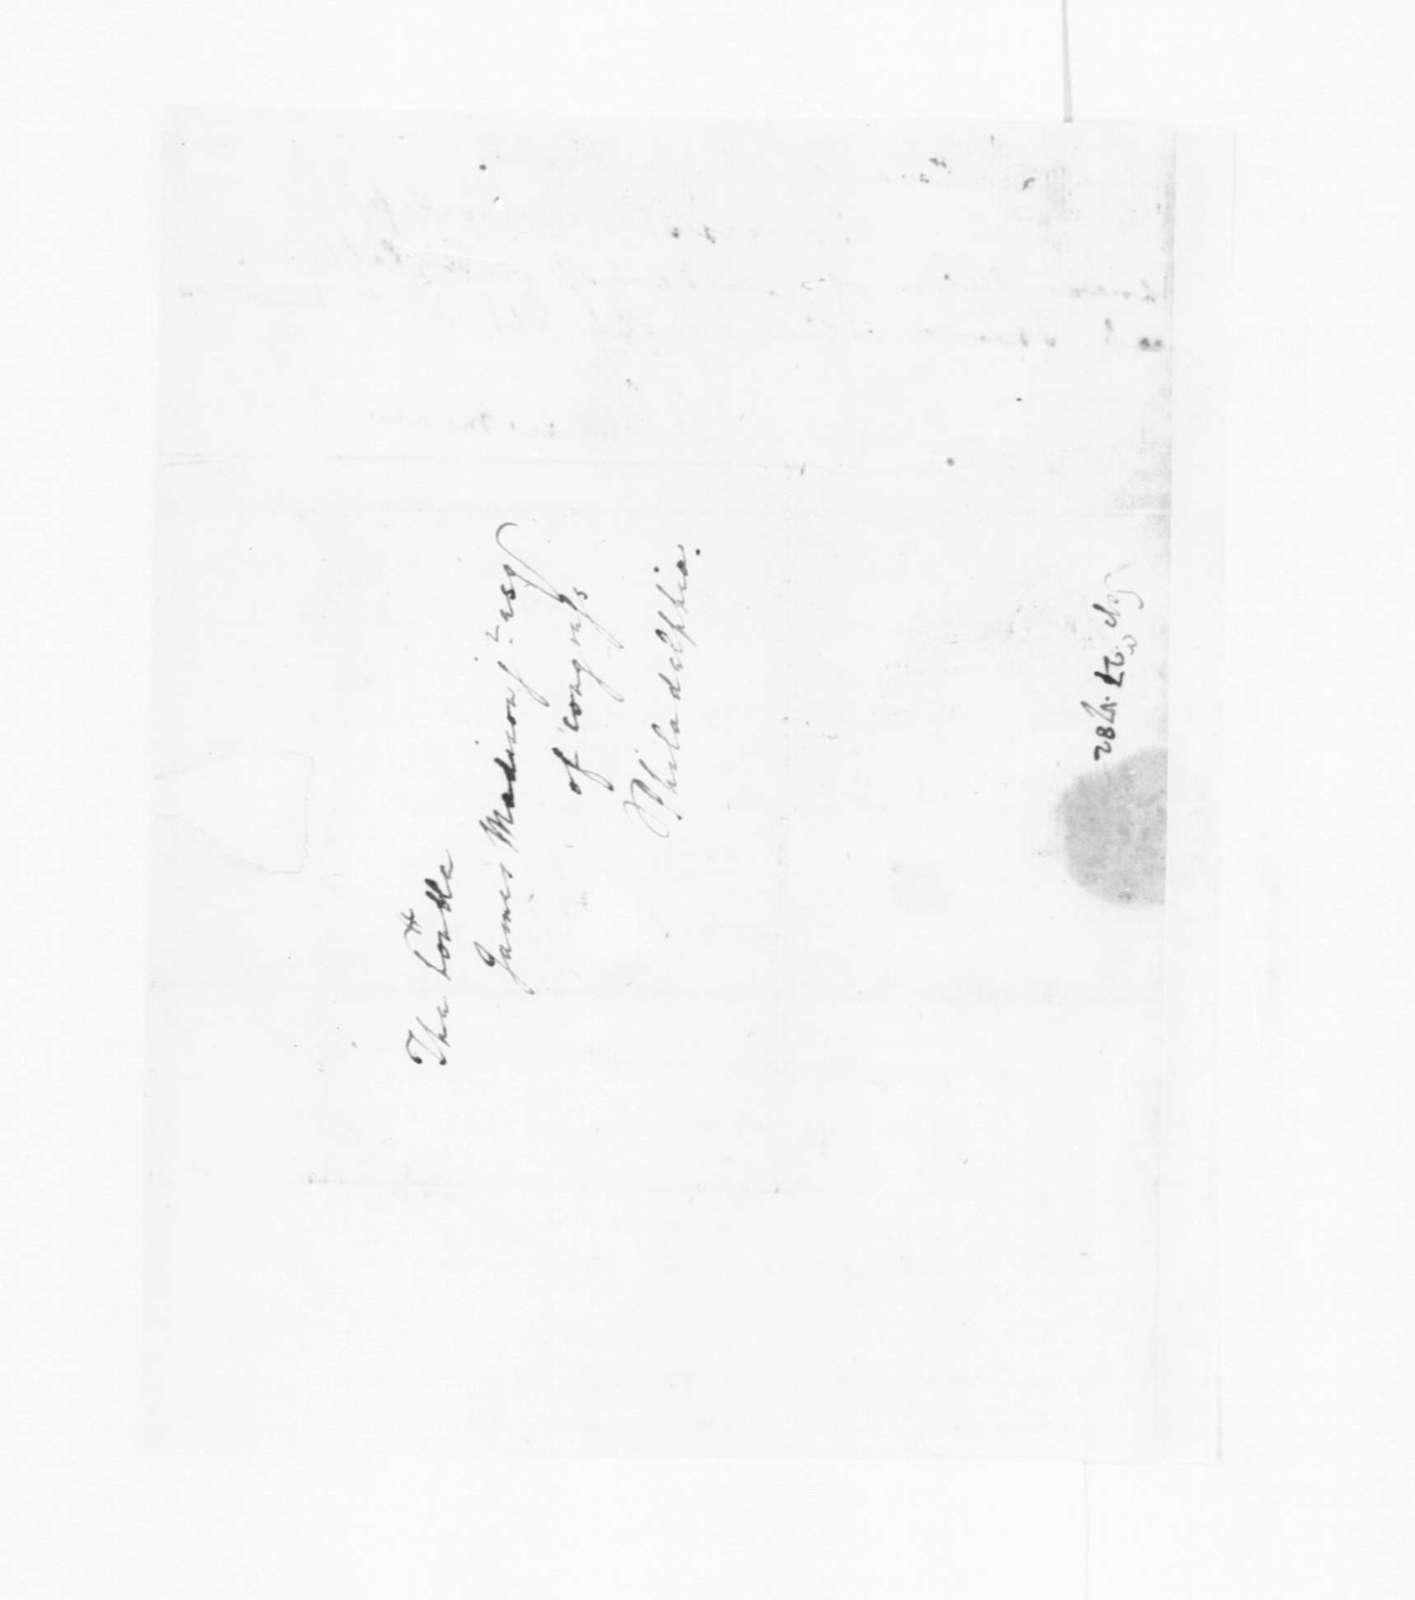 Edmund Randolph to James Madison, September,1782.